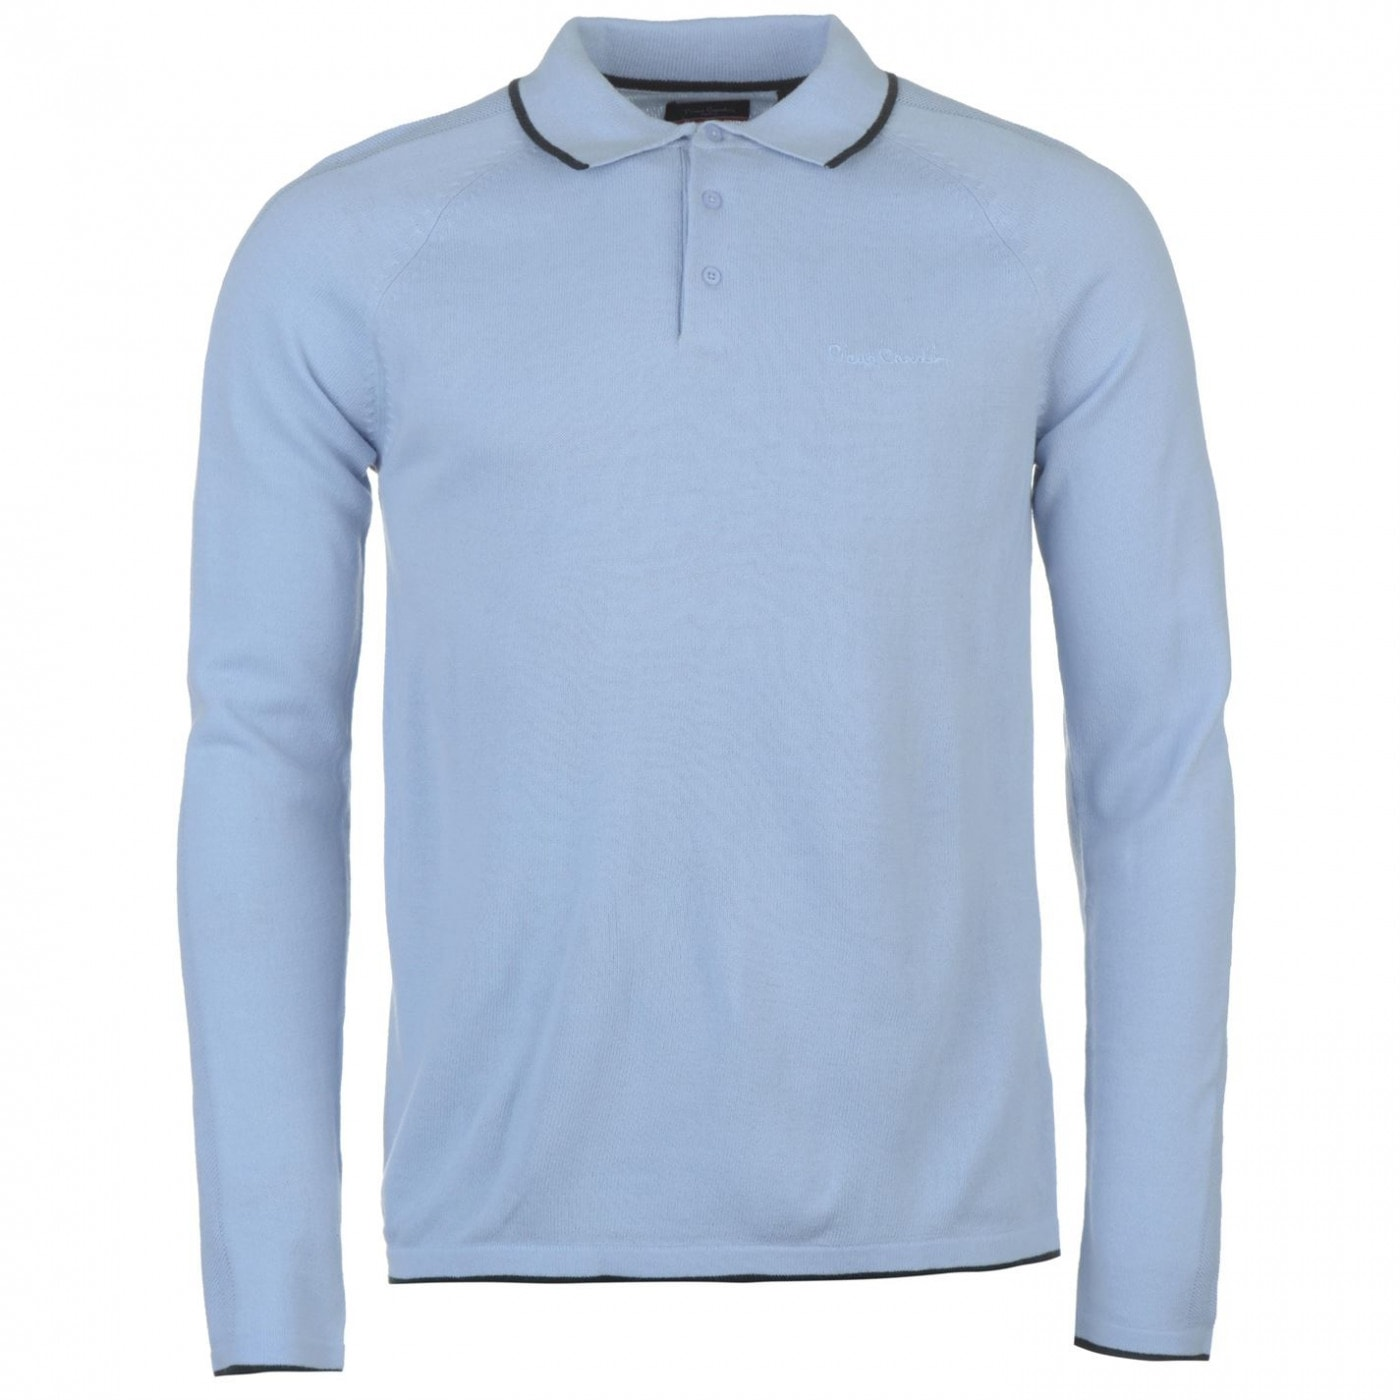 63e8d985ed1a Pierre Cardin Knitted Long Sleeve Polo Mens - ALIATIC